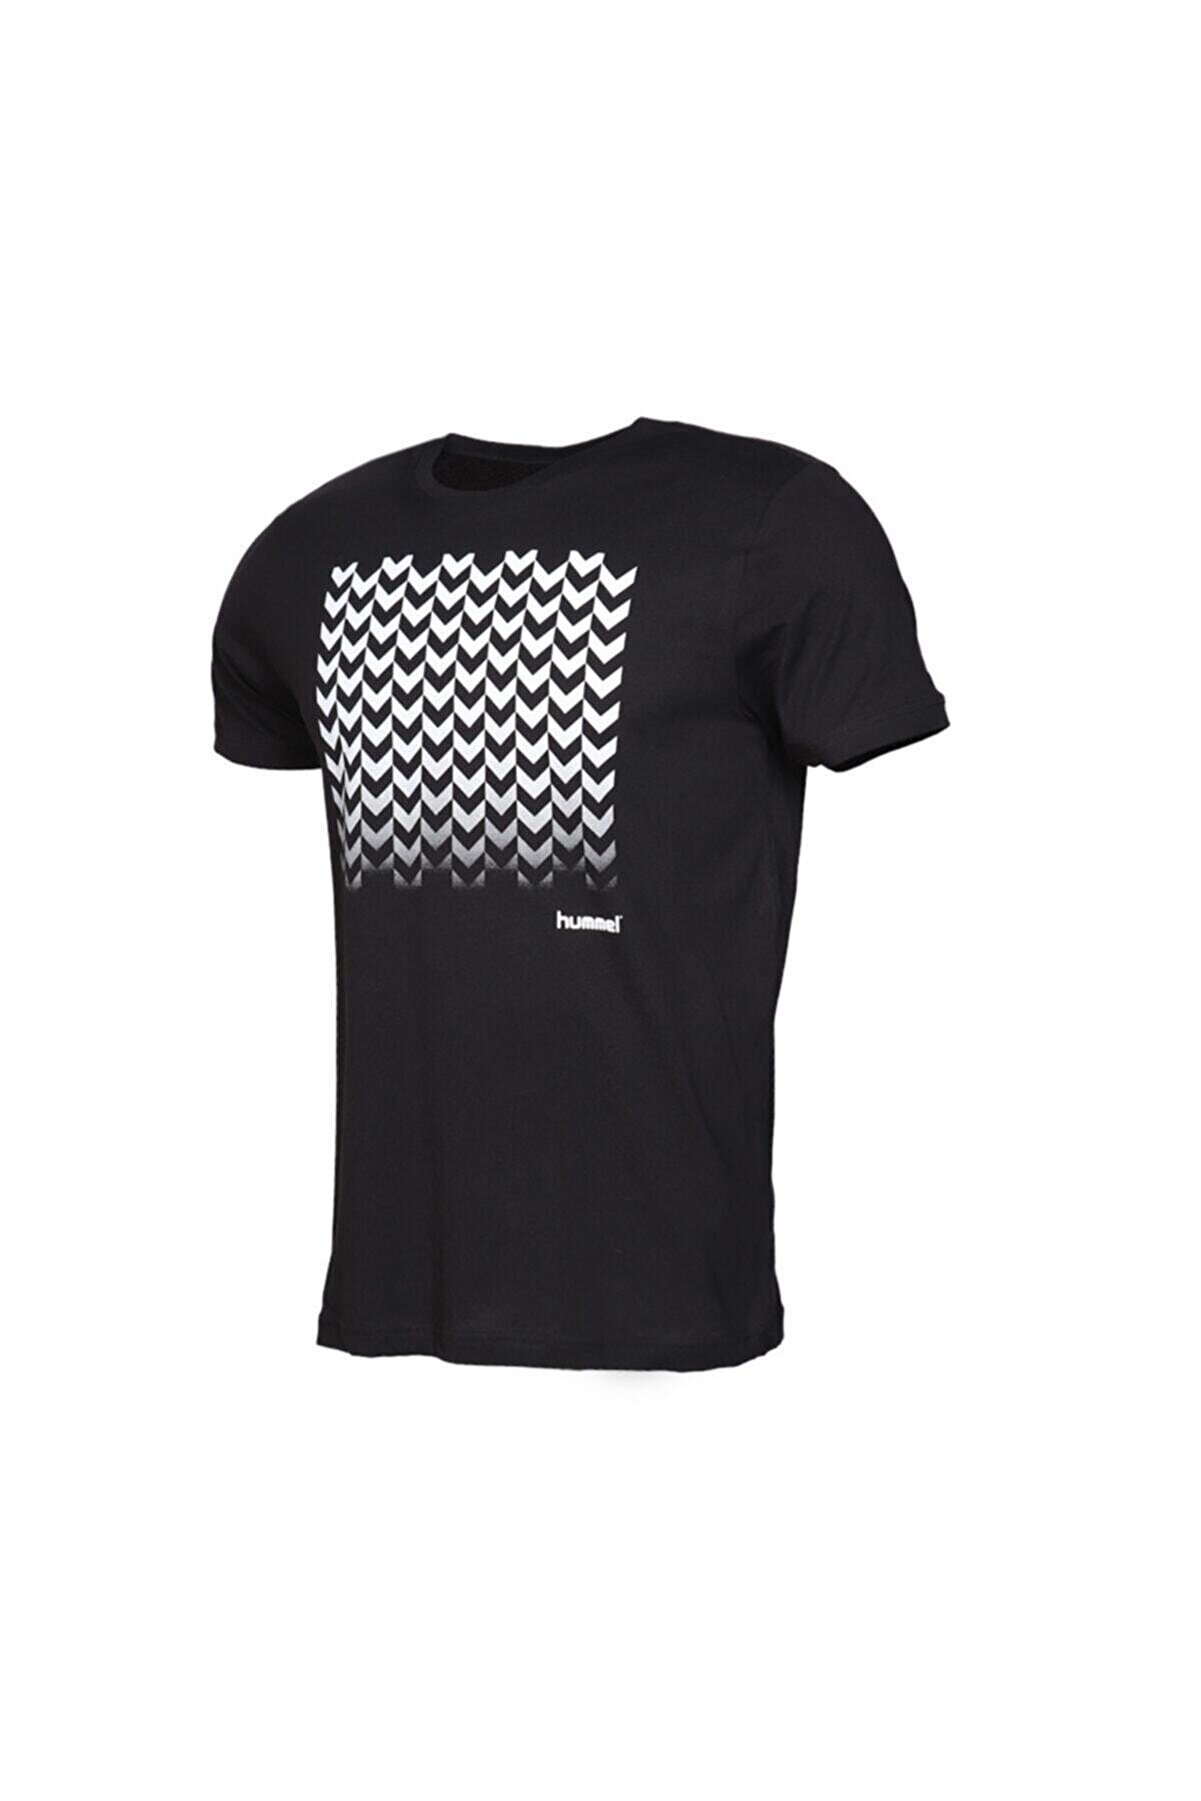 HUMMEL Lıam Kısa Kollu Tişört